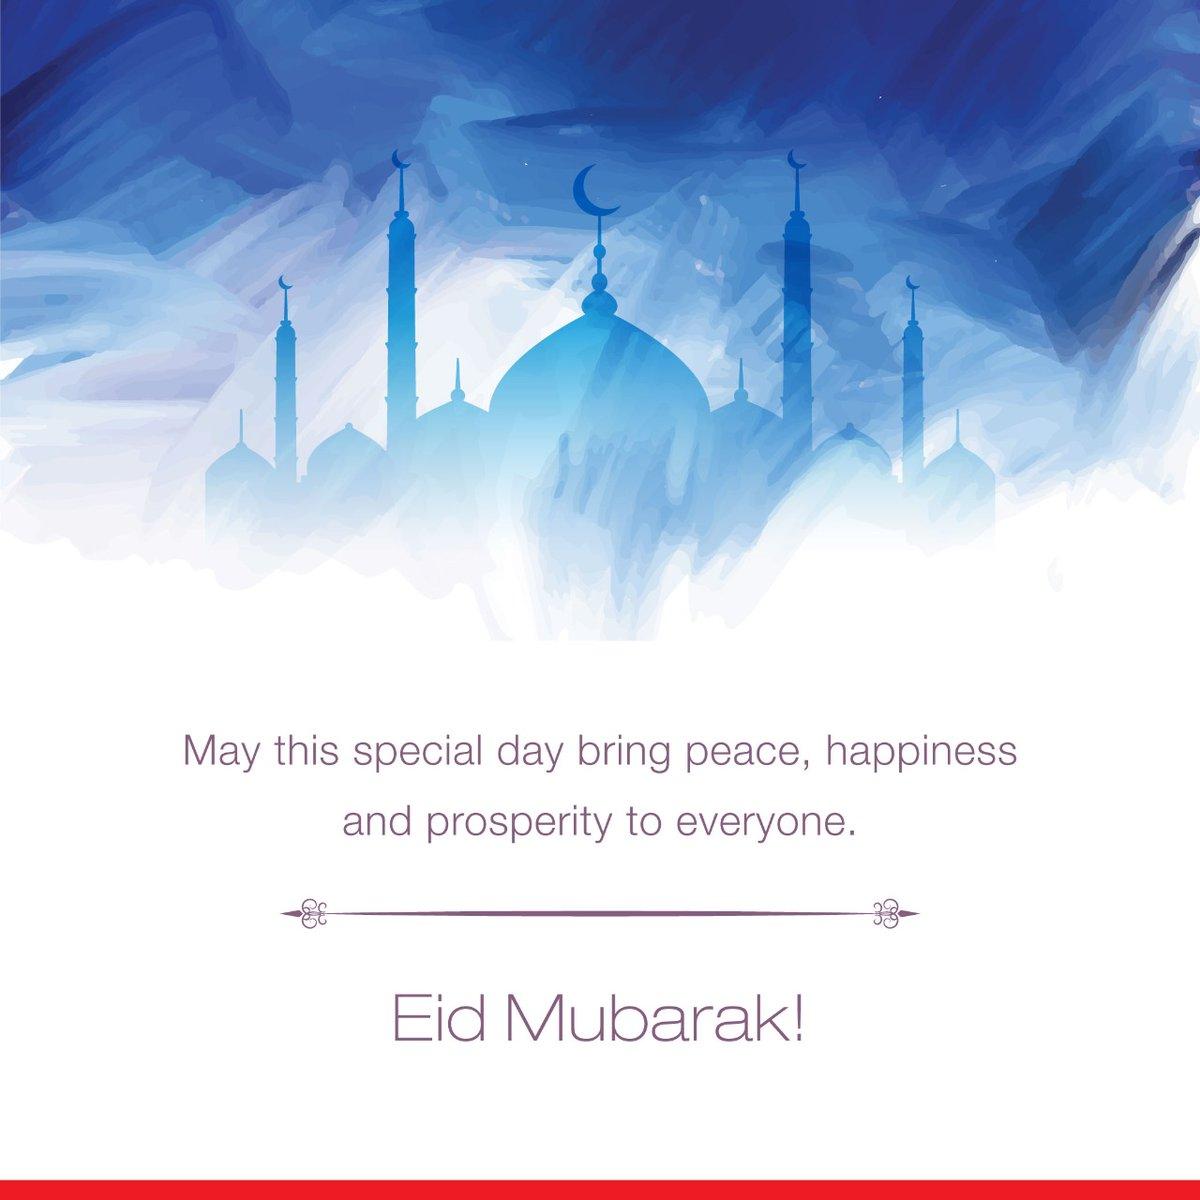 AM/NS India wishes you a joyous and safe #EidMubarak https://t.co/rZdzJ4RpJY